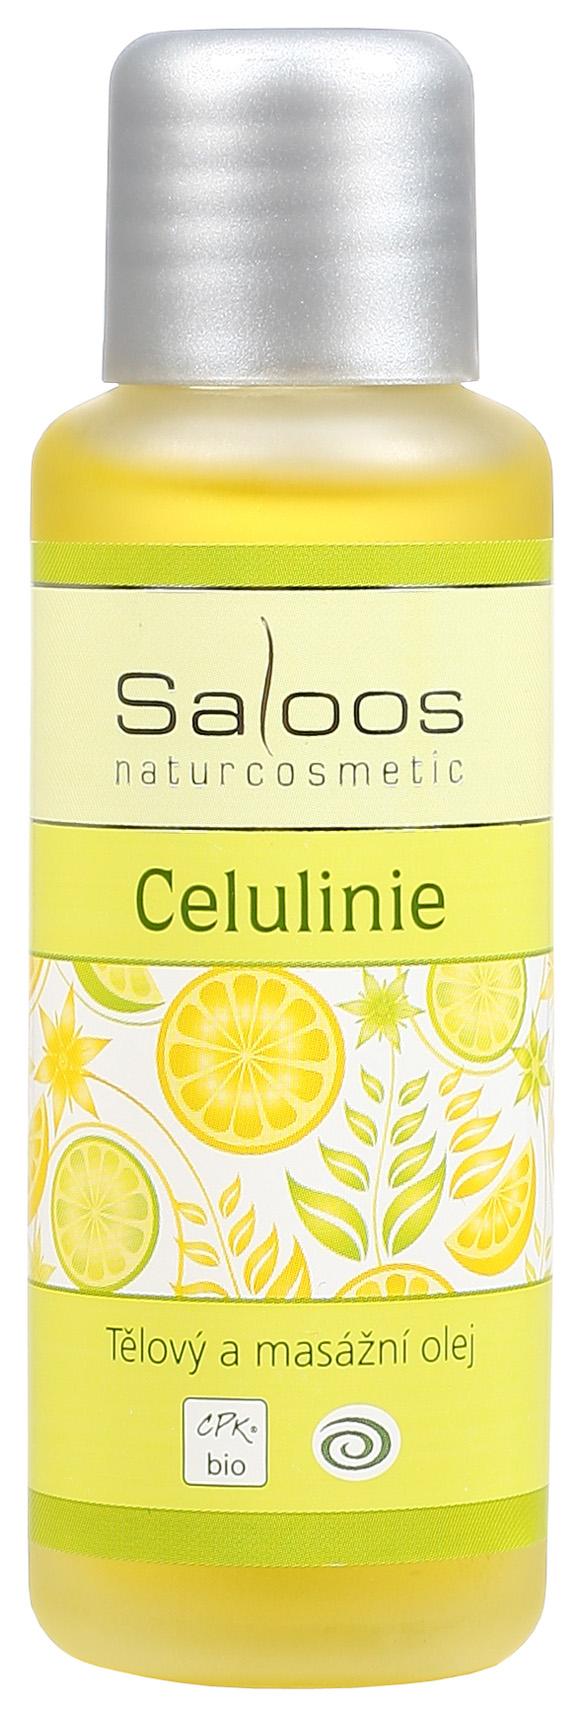 Saloos Bio Celulinie - tělový a masážní olej 50ml